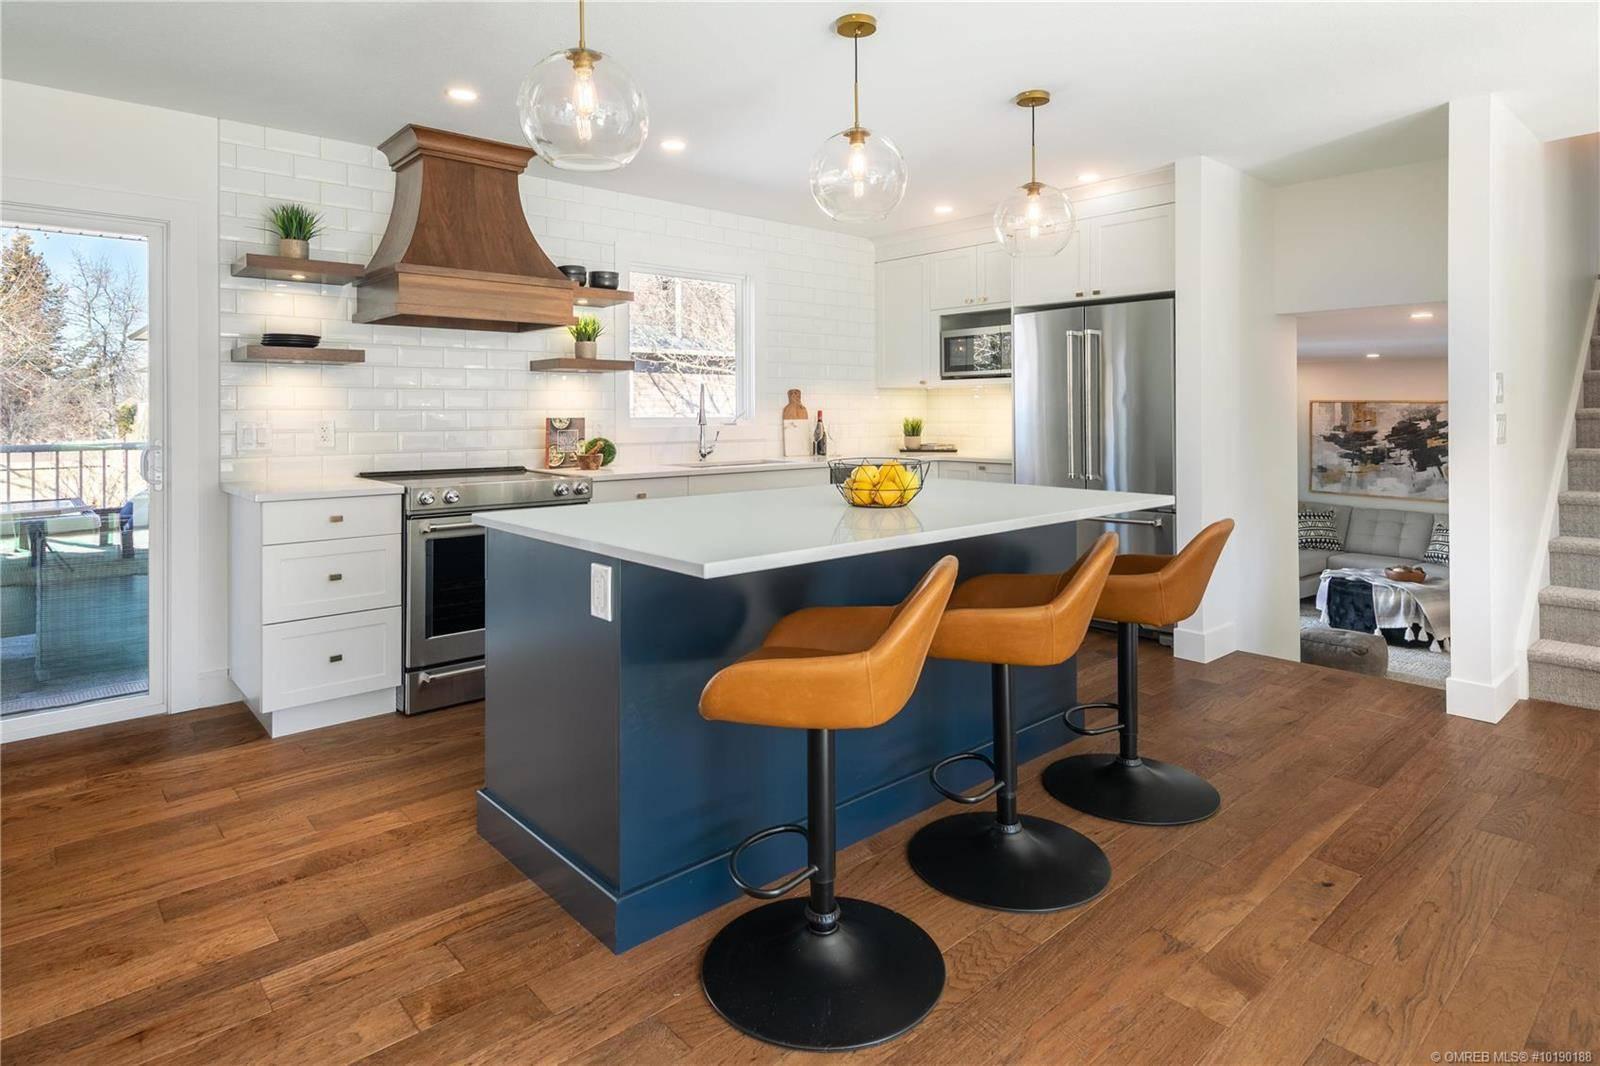 House for sale at 716 Vance Ave Kelowna British Columbia - MLS: 10190188